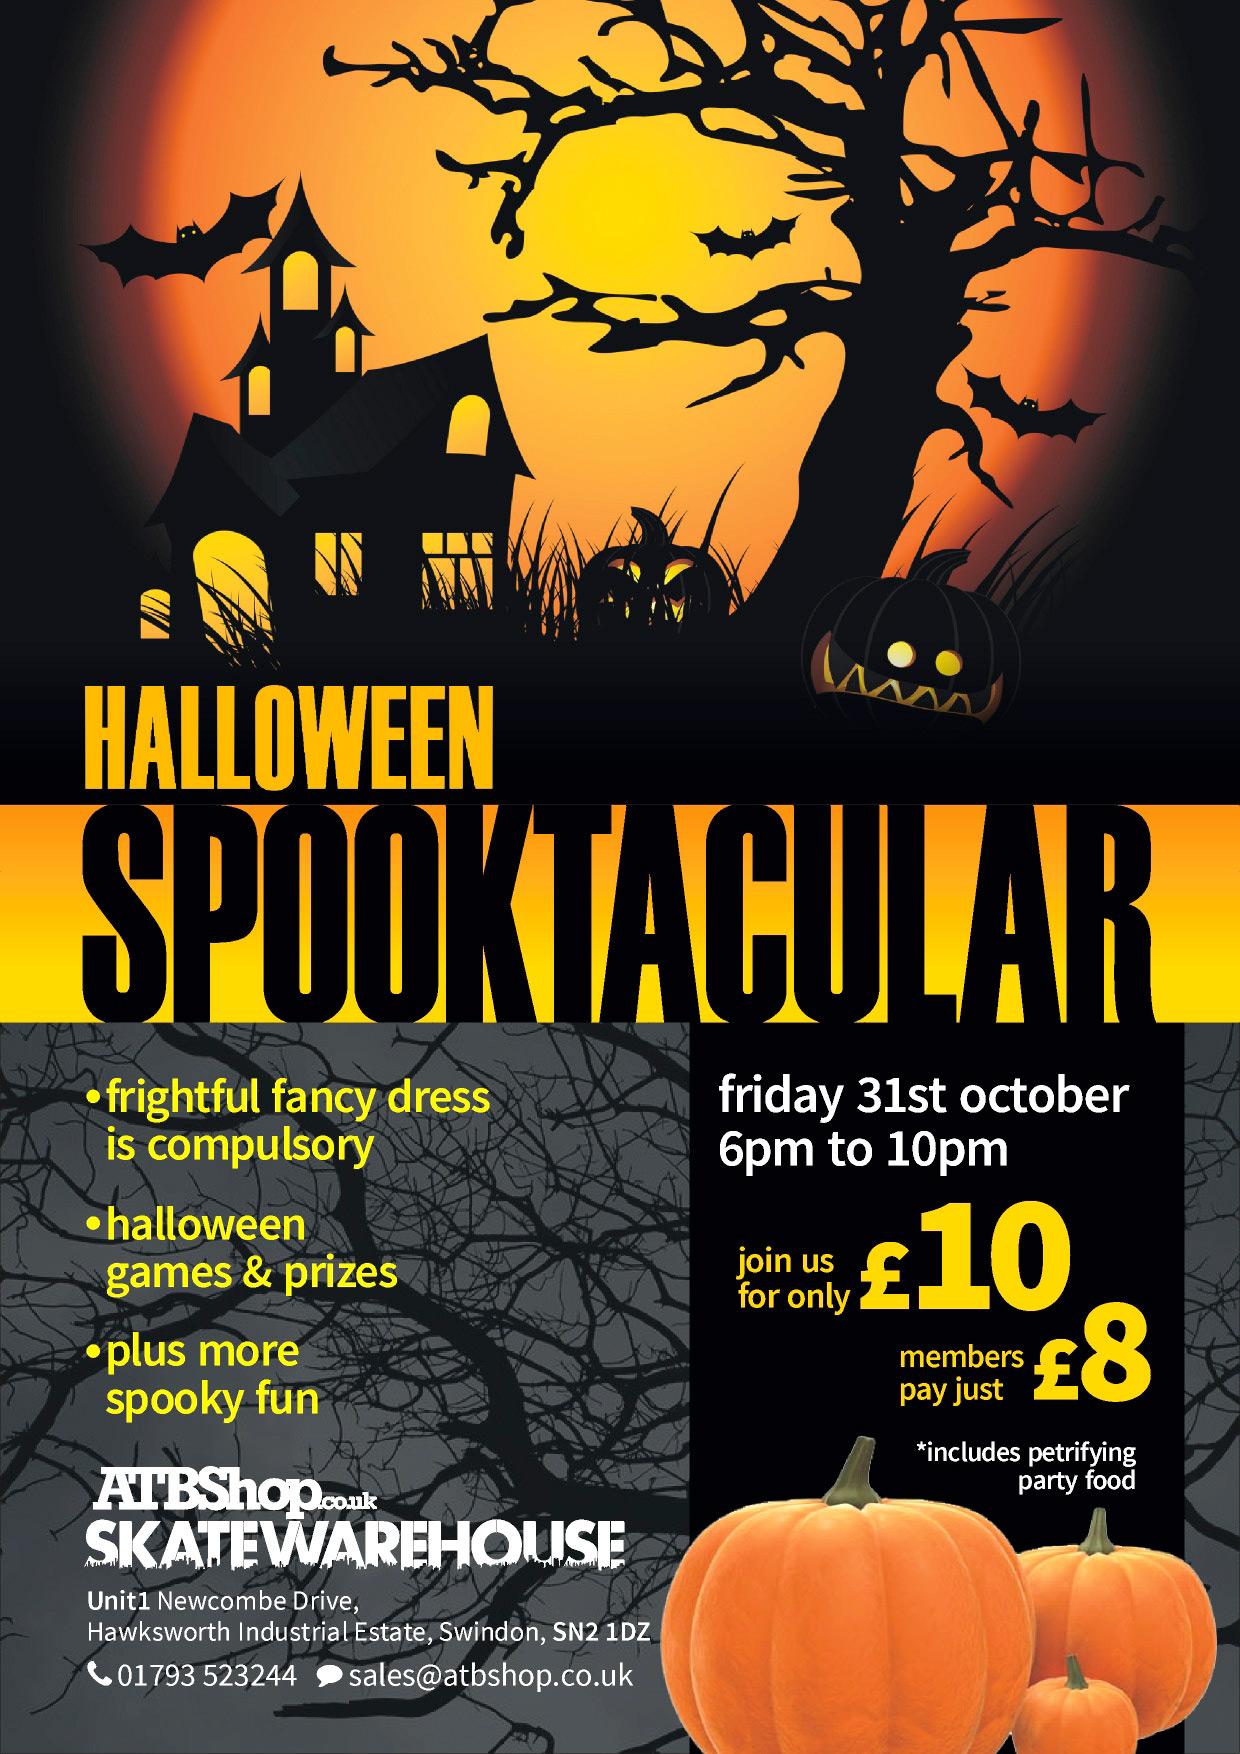 halloween-spooktacular-poster - ATBShop Skate Warehouse